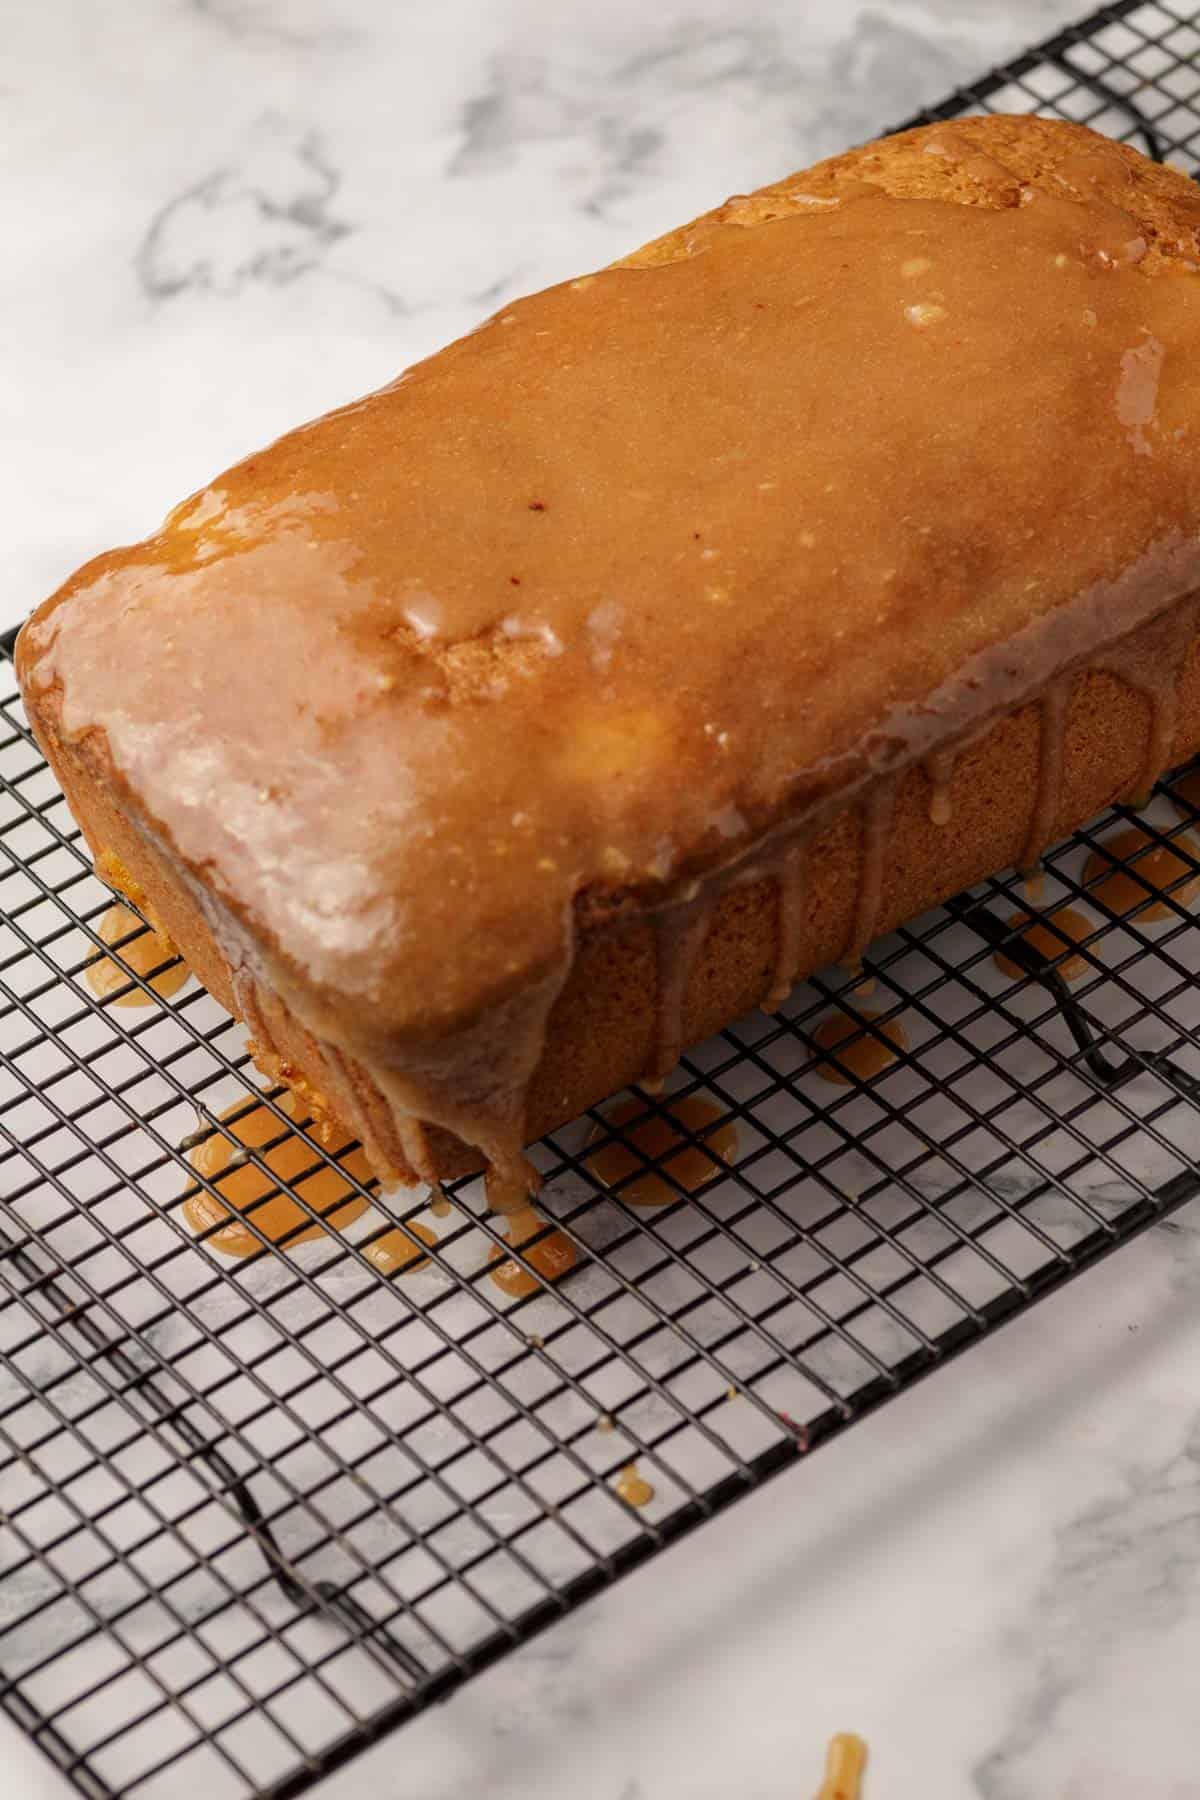 A peach pound cake covered in glaze